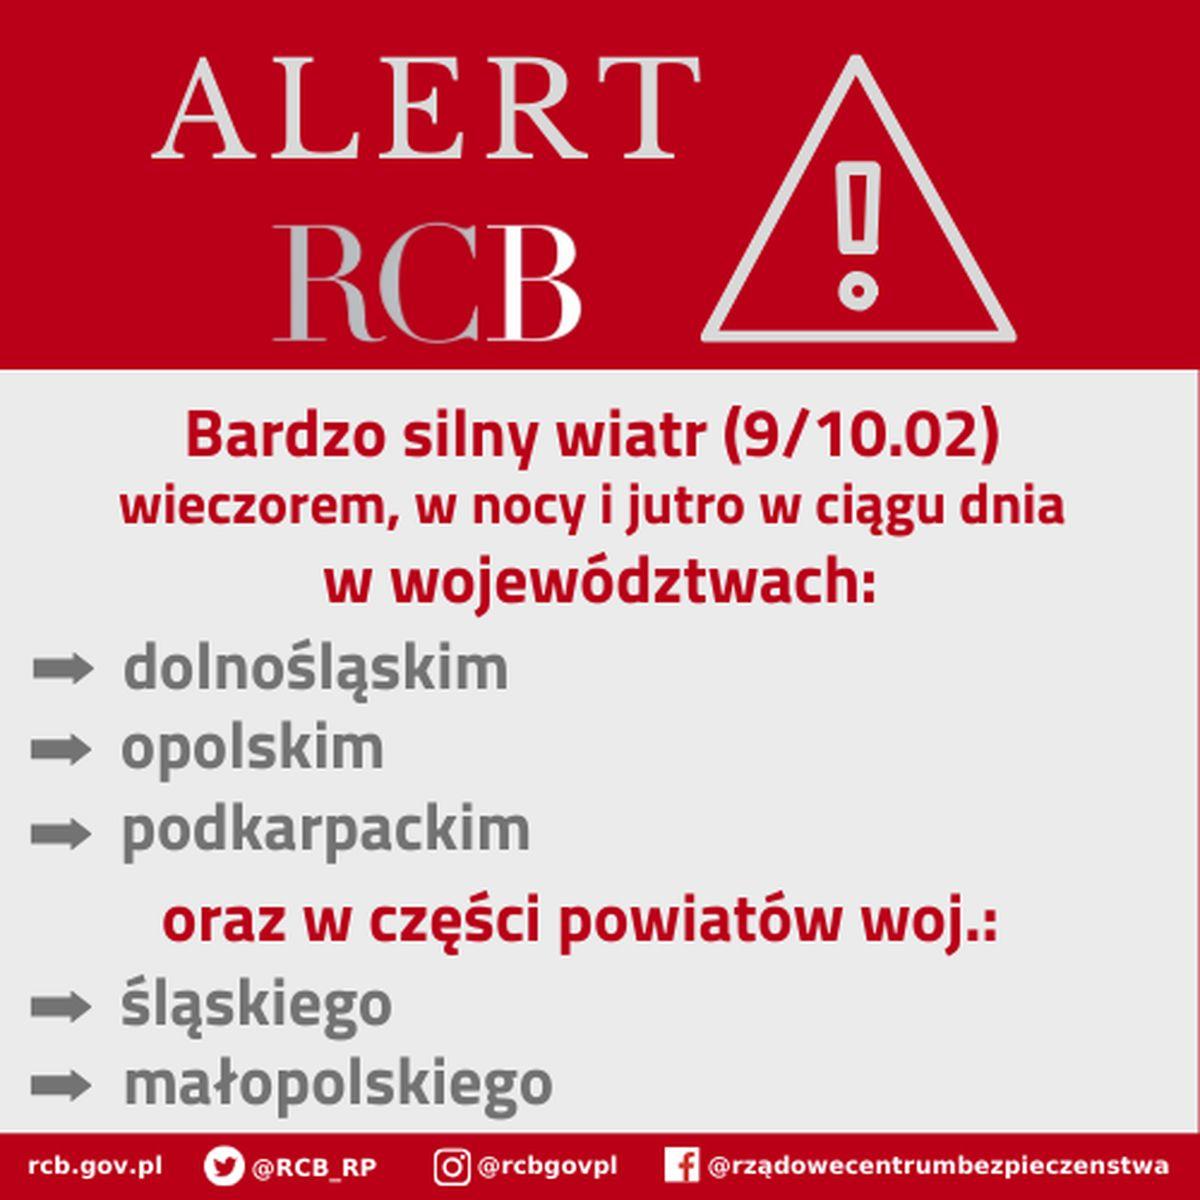 Alert RCB wdniach 09/10 lutego 2020 roku